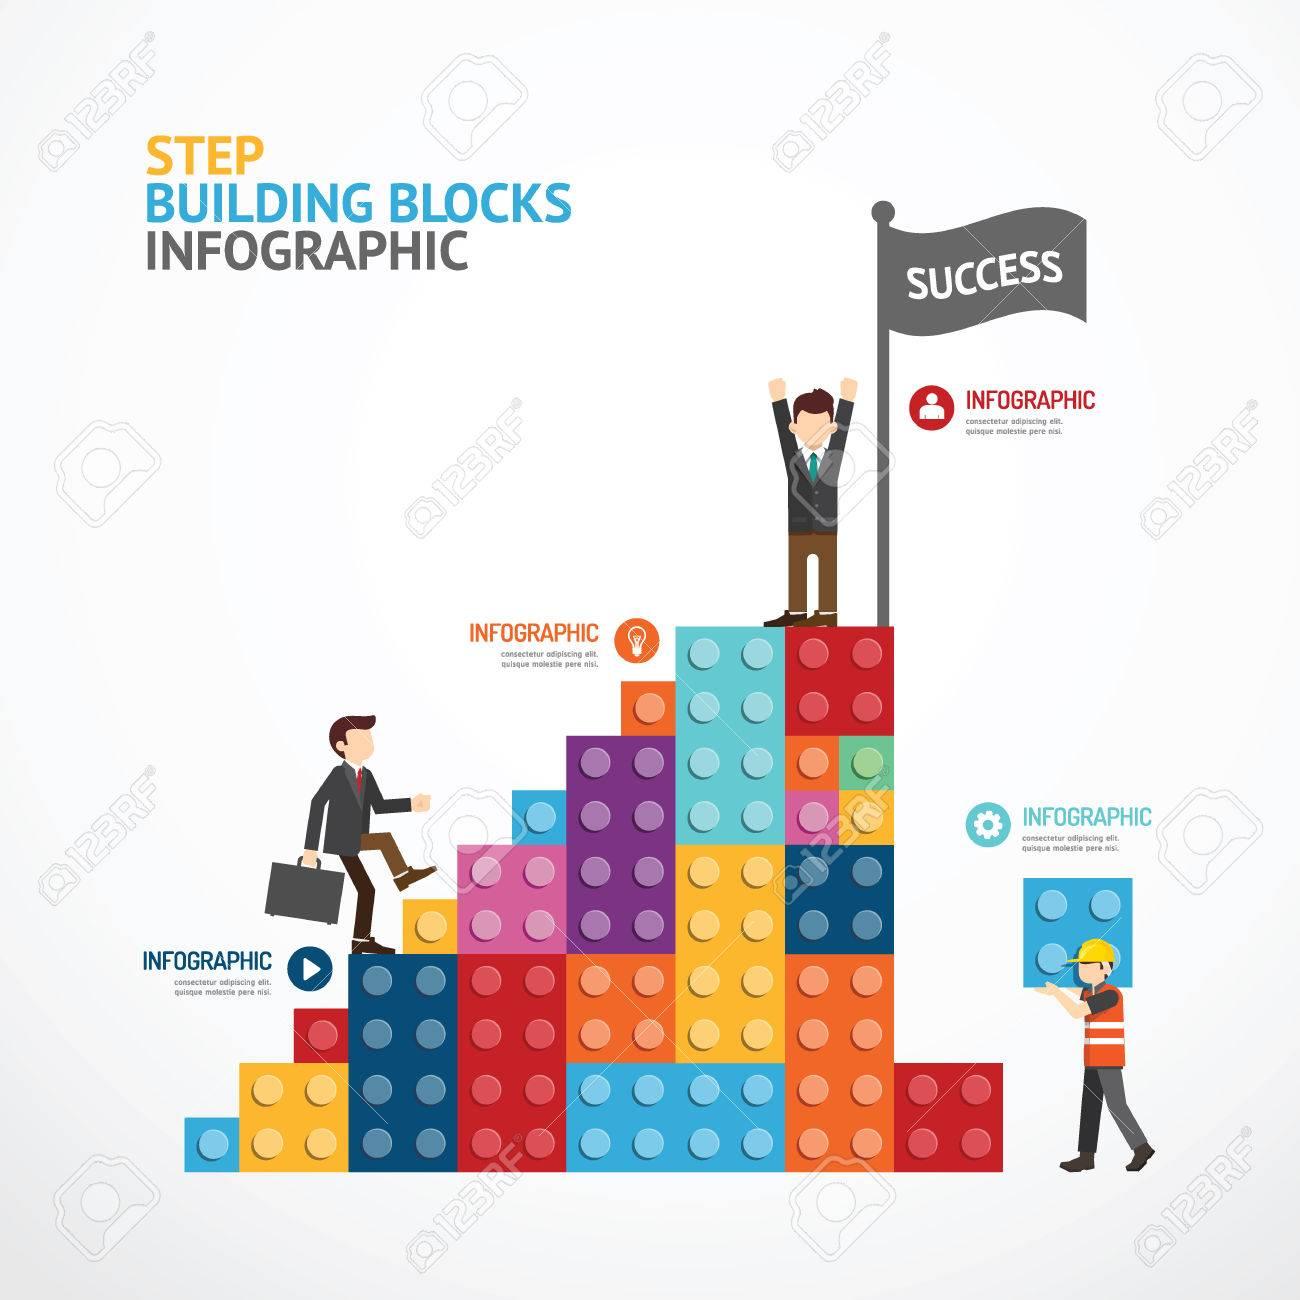 infographic template step building blocks concept illustration